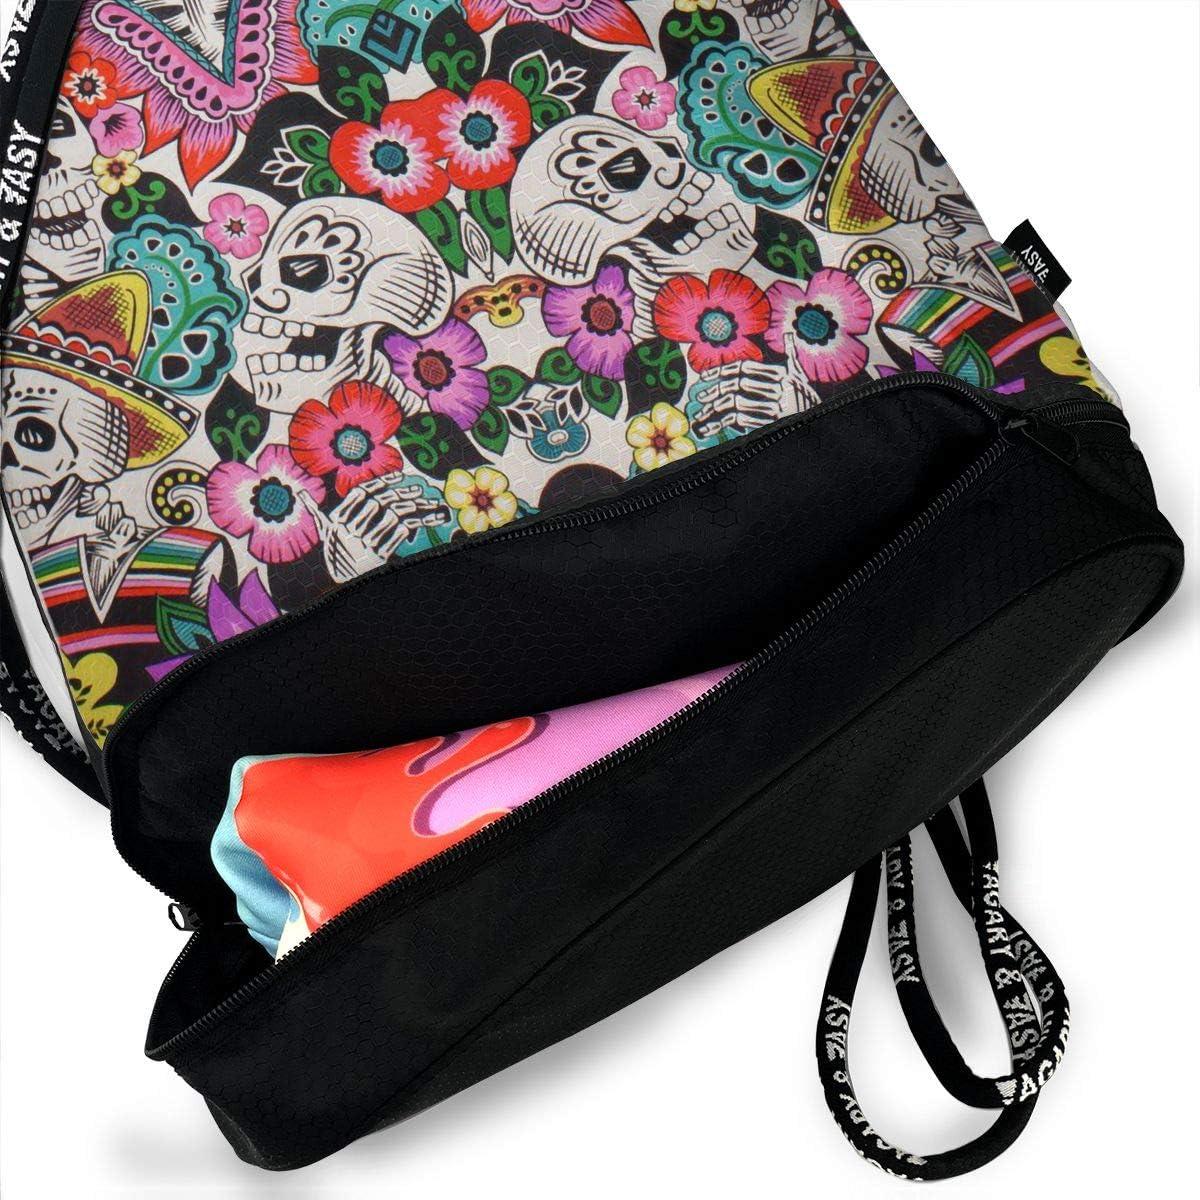 Drawstring Backpack Sugar Skull Shoulder Bags